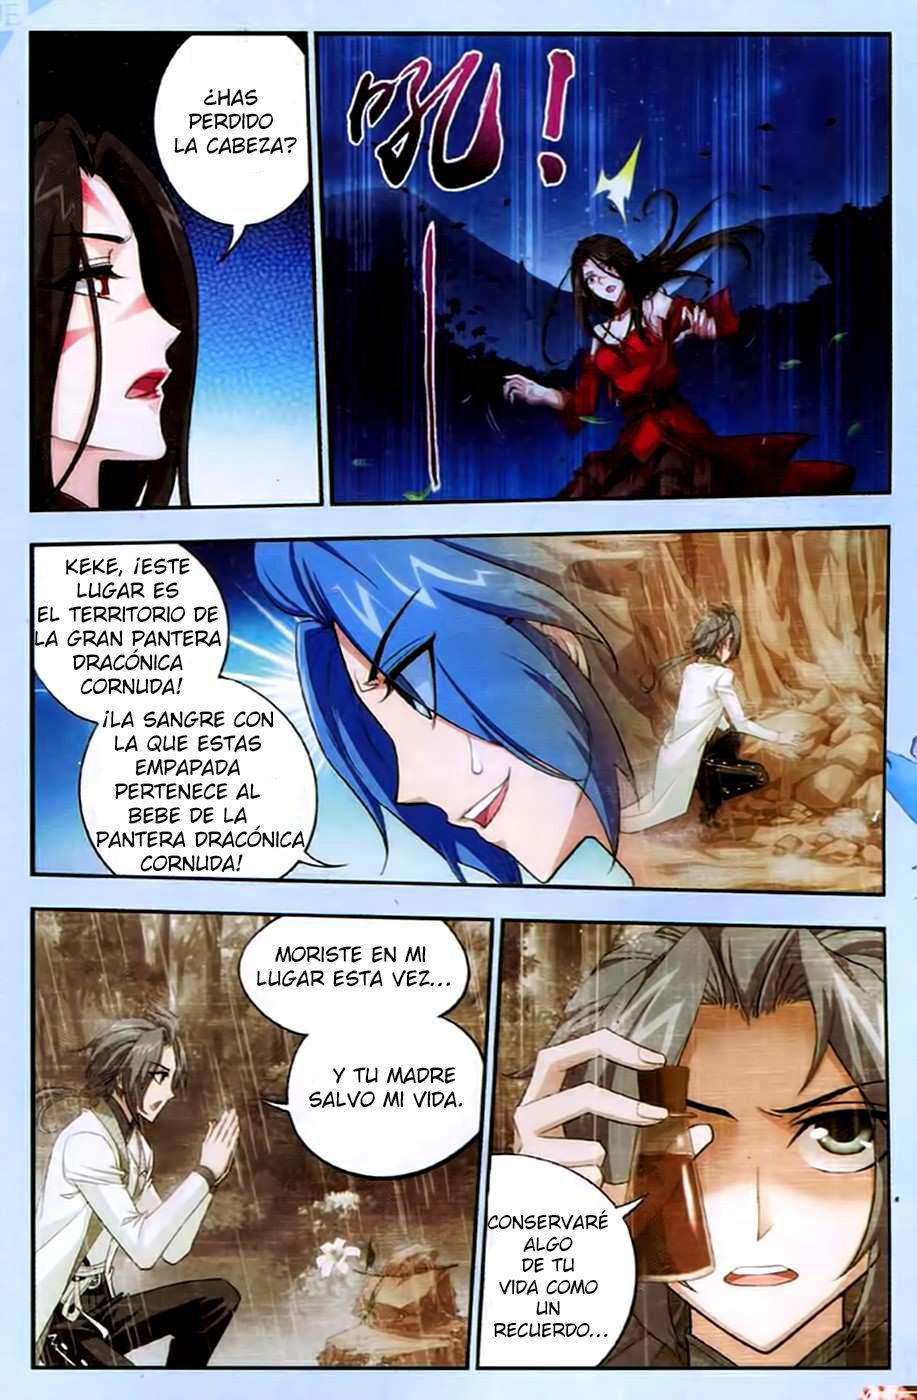 http://c5.ninemanga.com/es_manga/26/16346/457755/2cafb8837608901ff71d592338721a4d.jpg Page 17